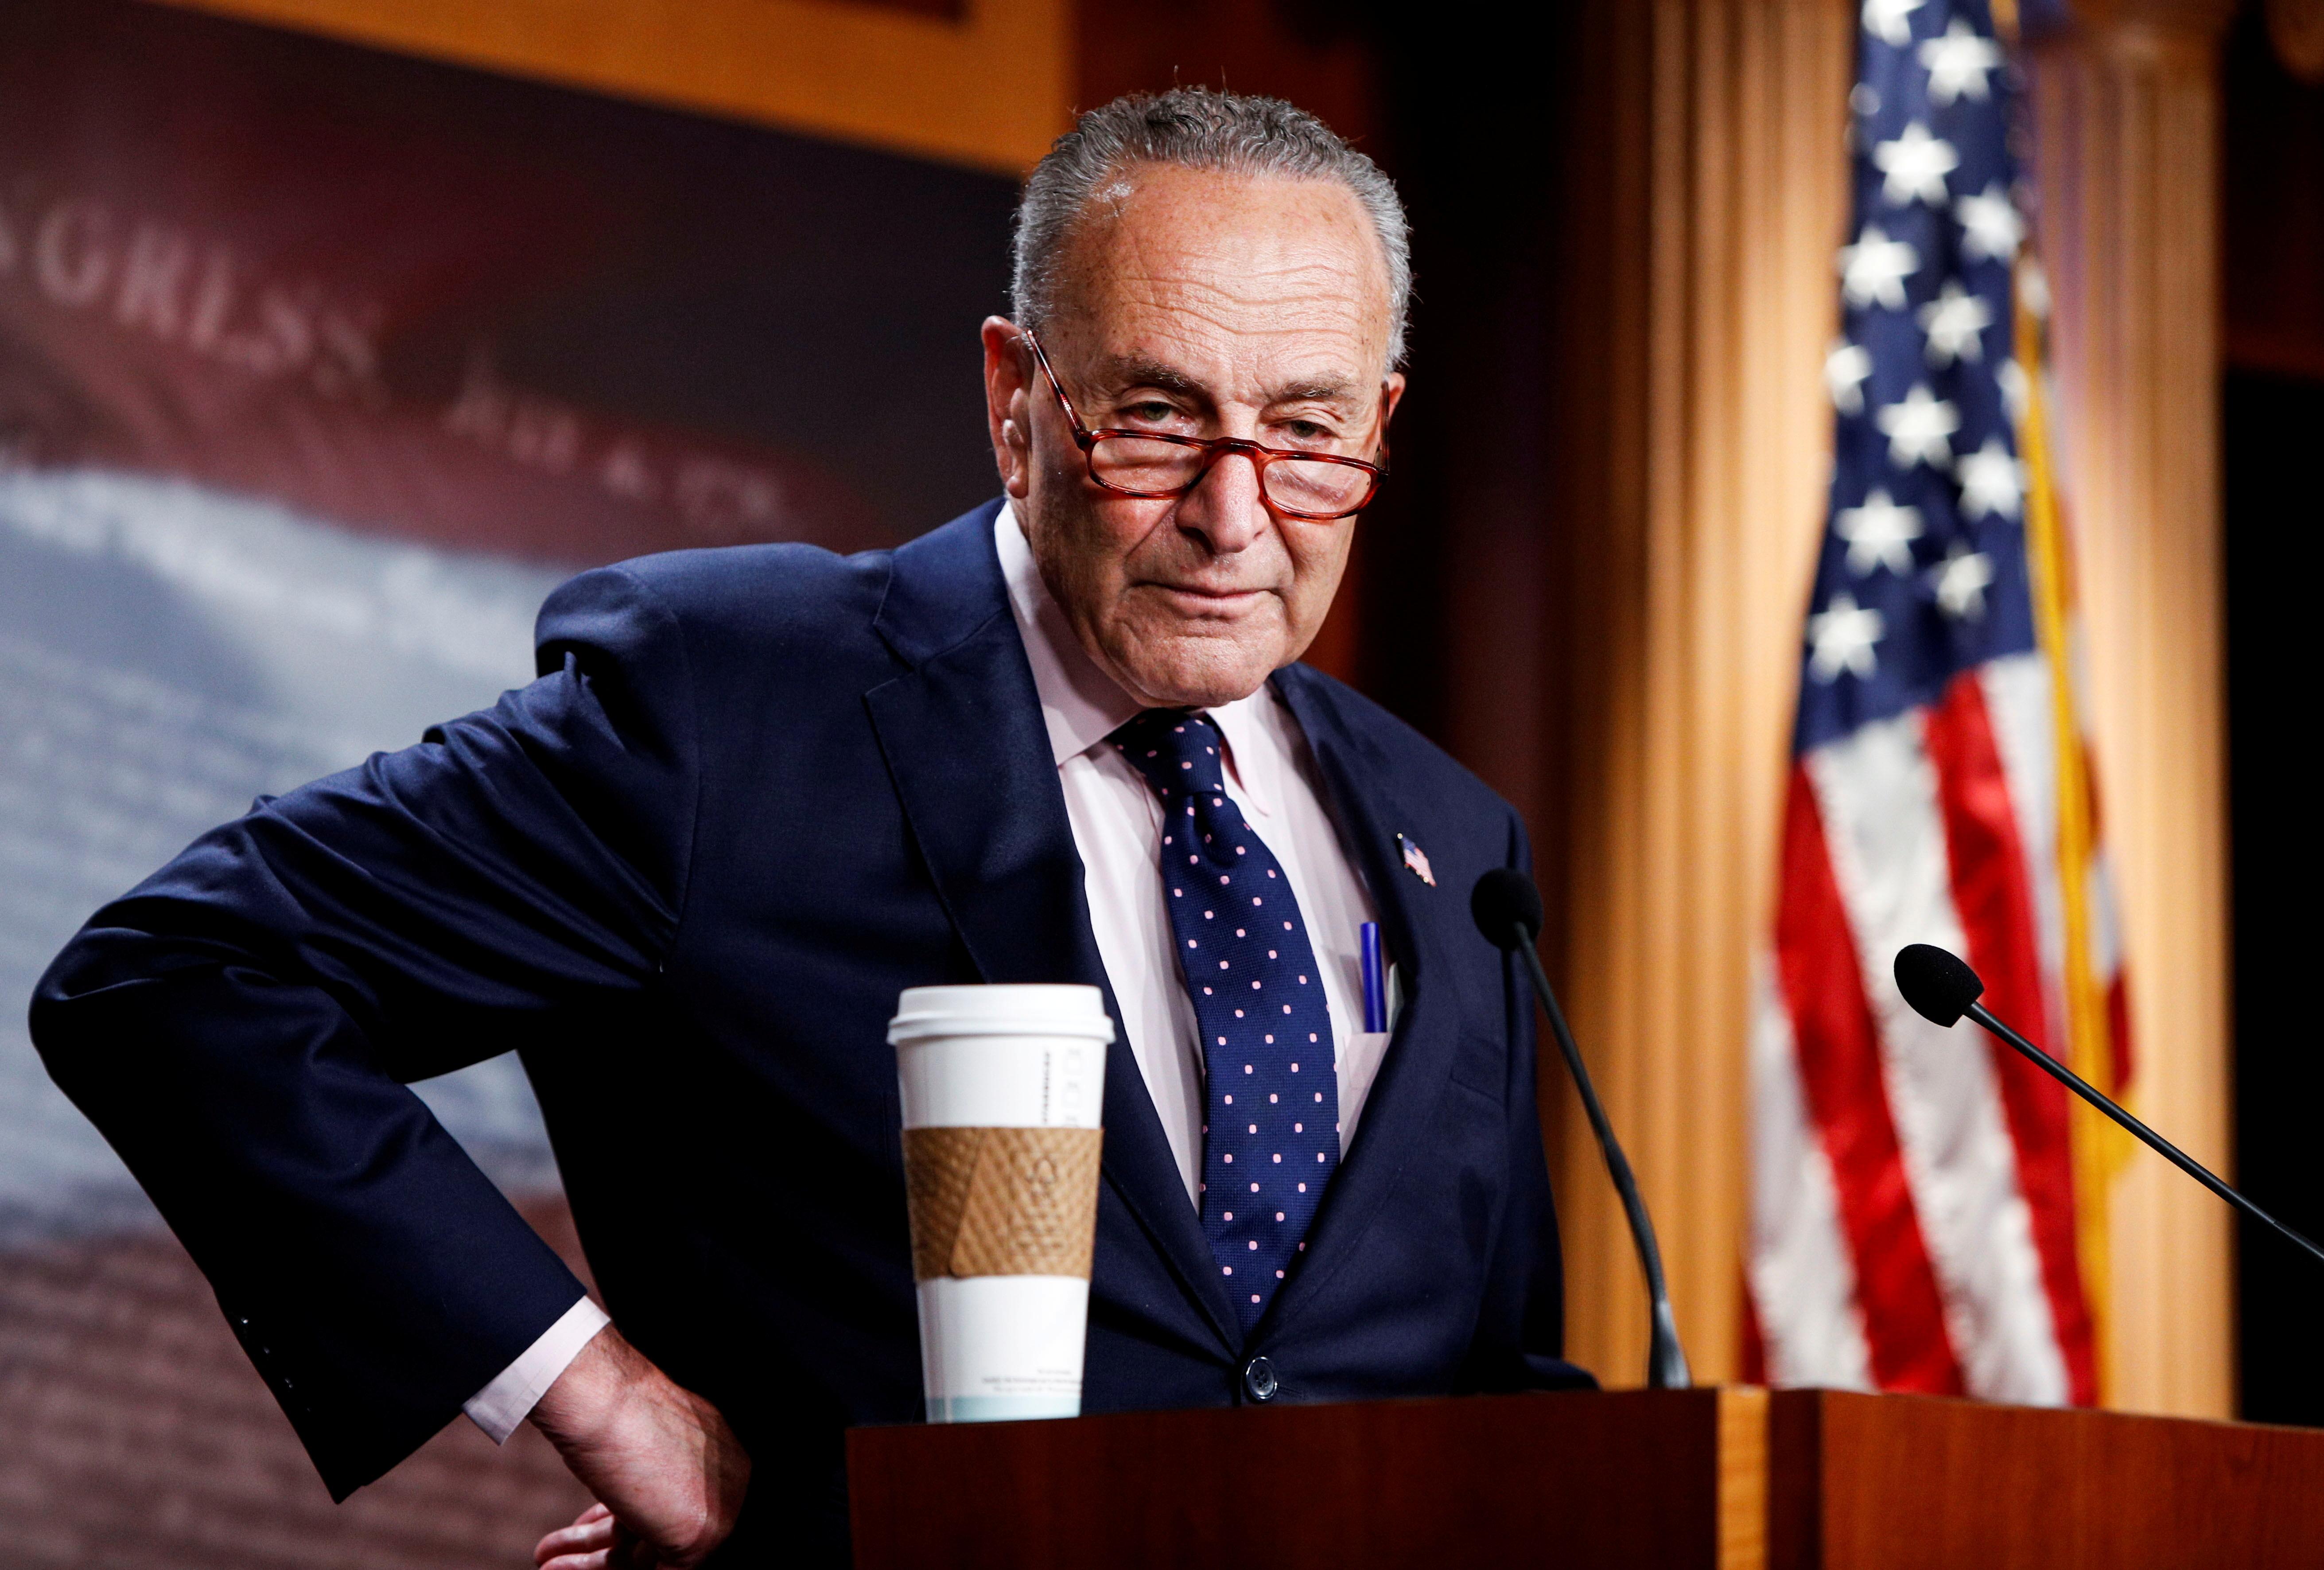 U.S. Senate Majority Leader Chuck Schumer at a news conference at the U.S. Capitol in Washington, U.S., August 11, 2021. REUTERS/Gabrielle Crockett